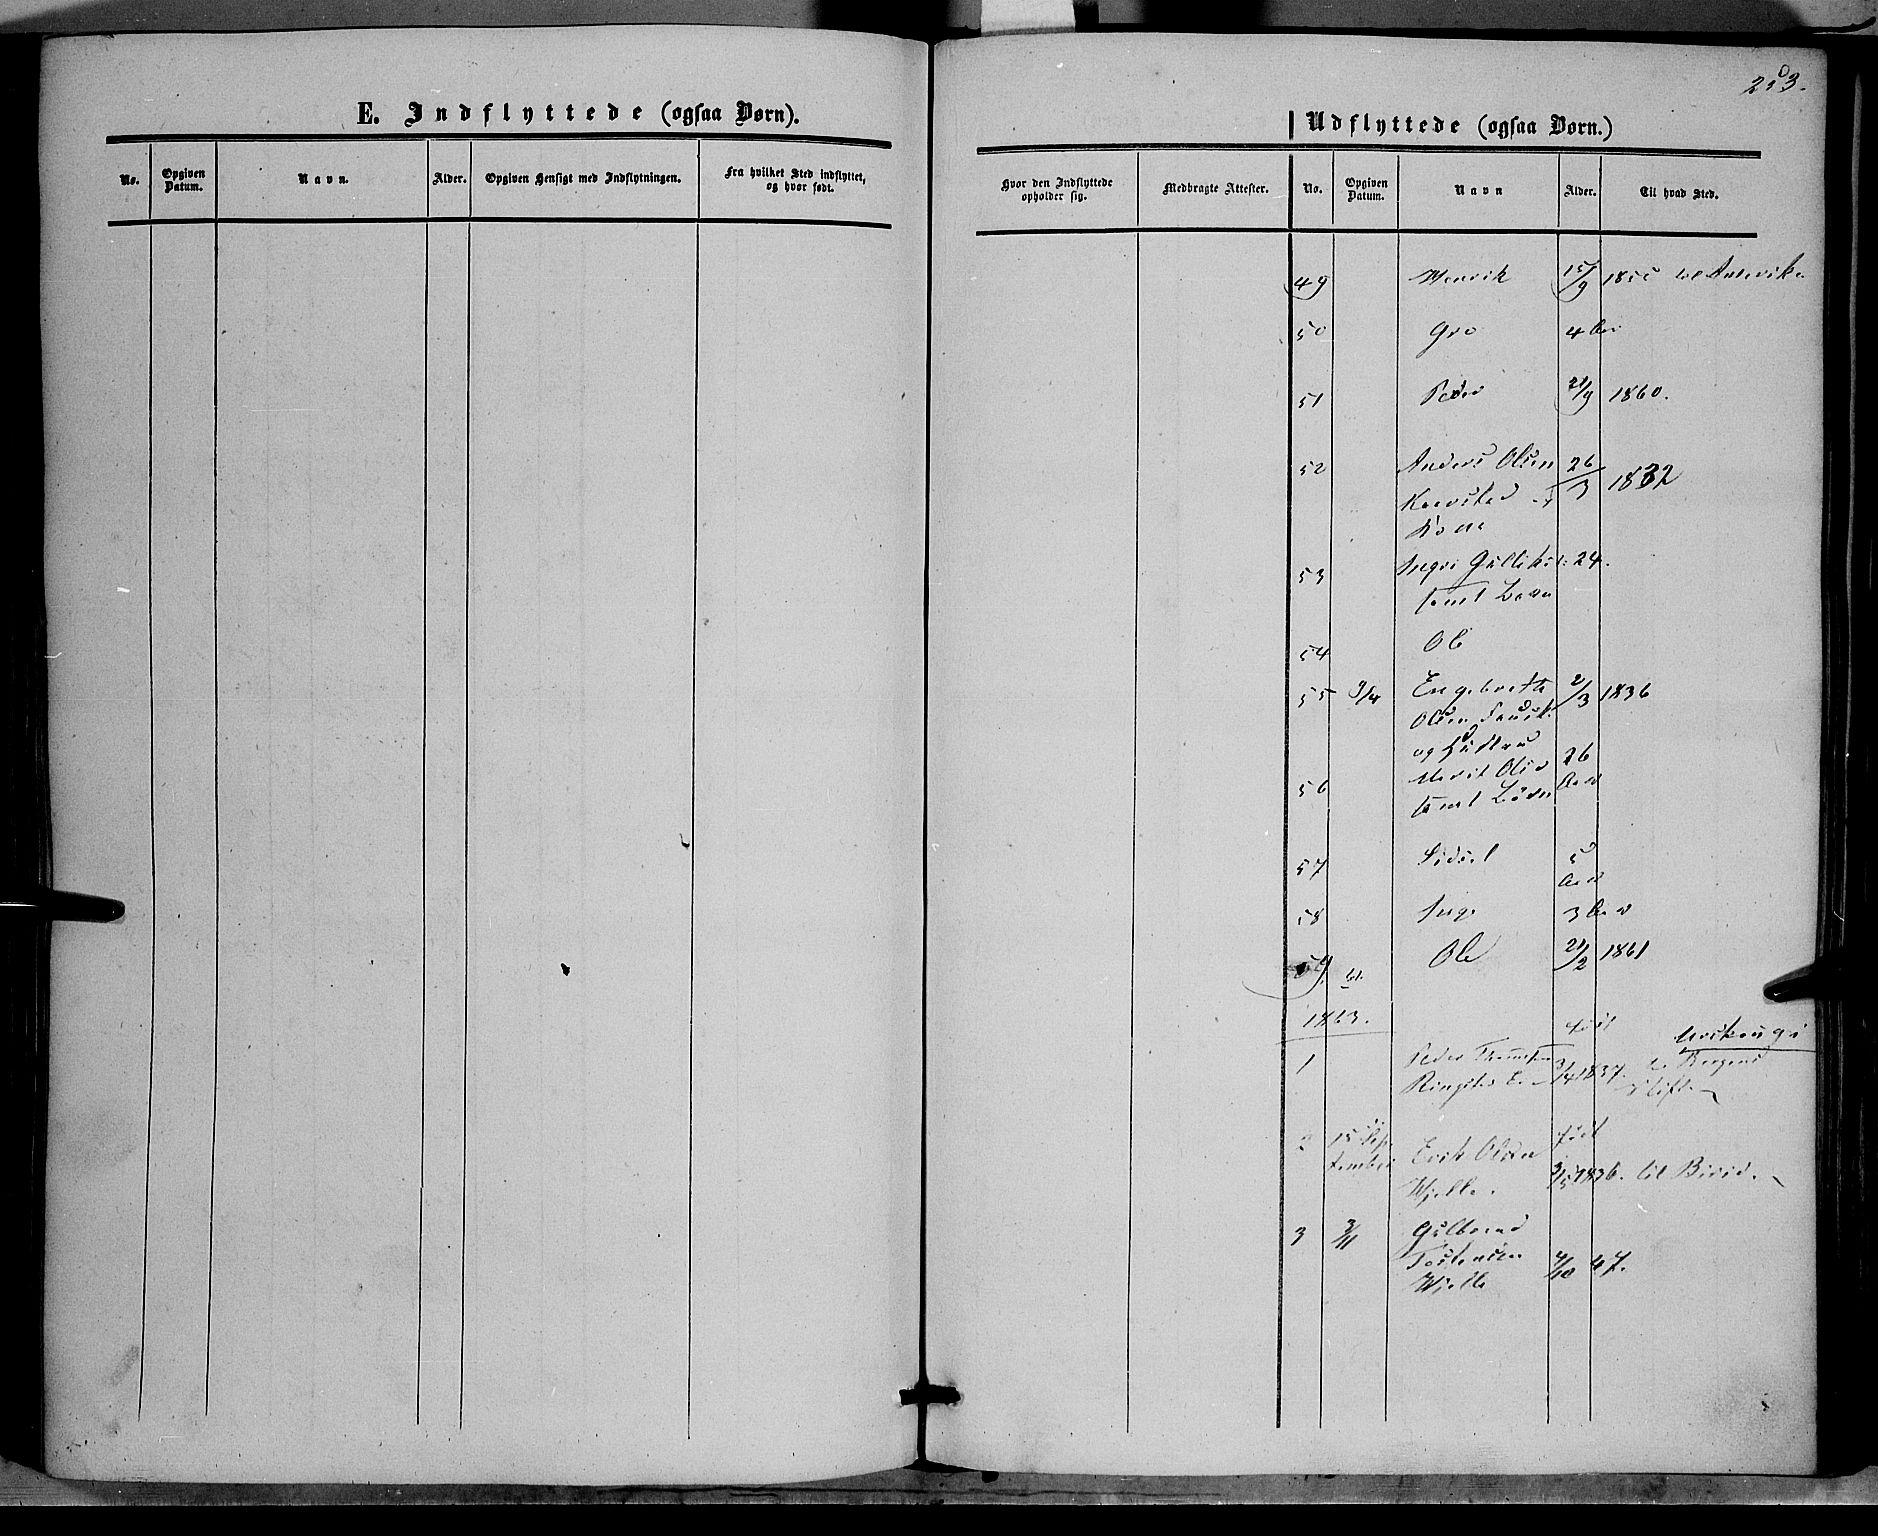 SAH, Vestre Slidre prestekontor, Ministerialbok nr. 2, 1856-1864, s. 253